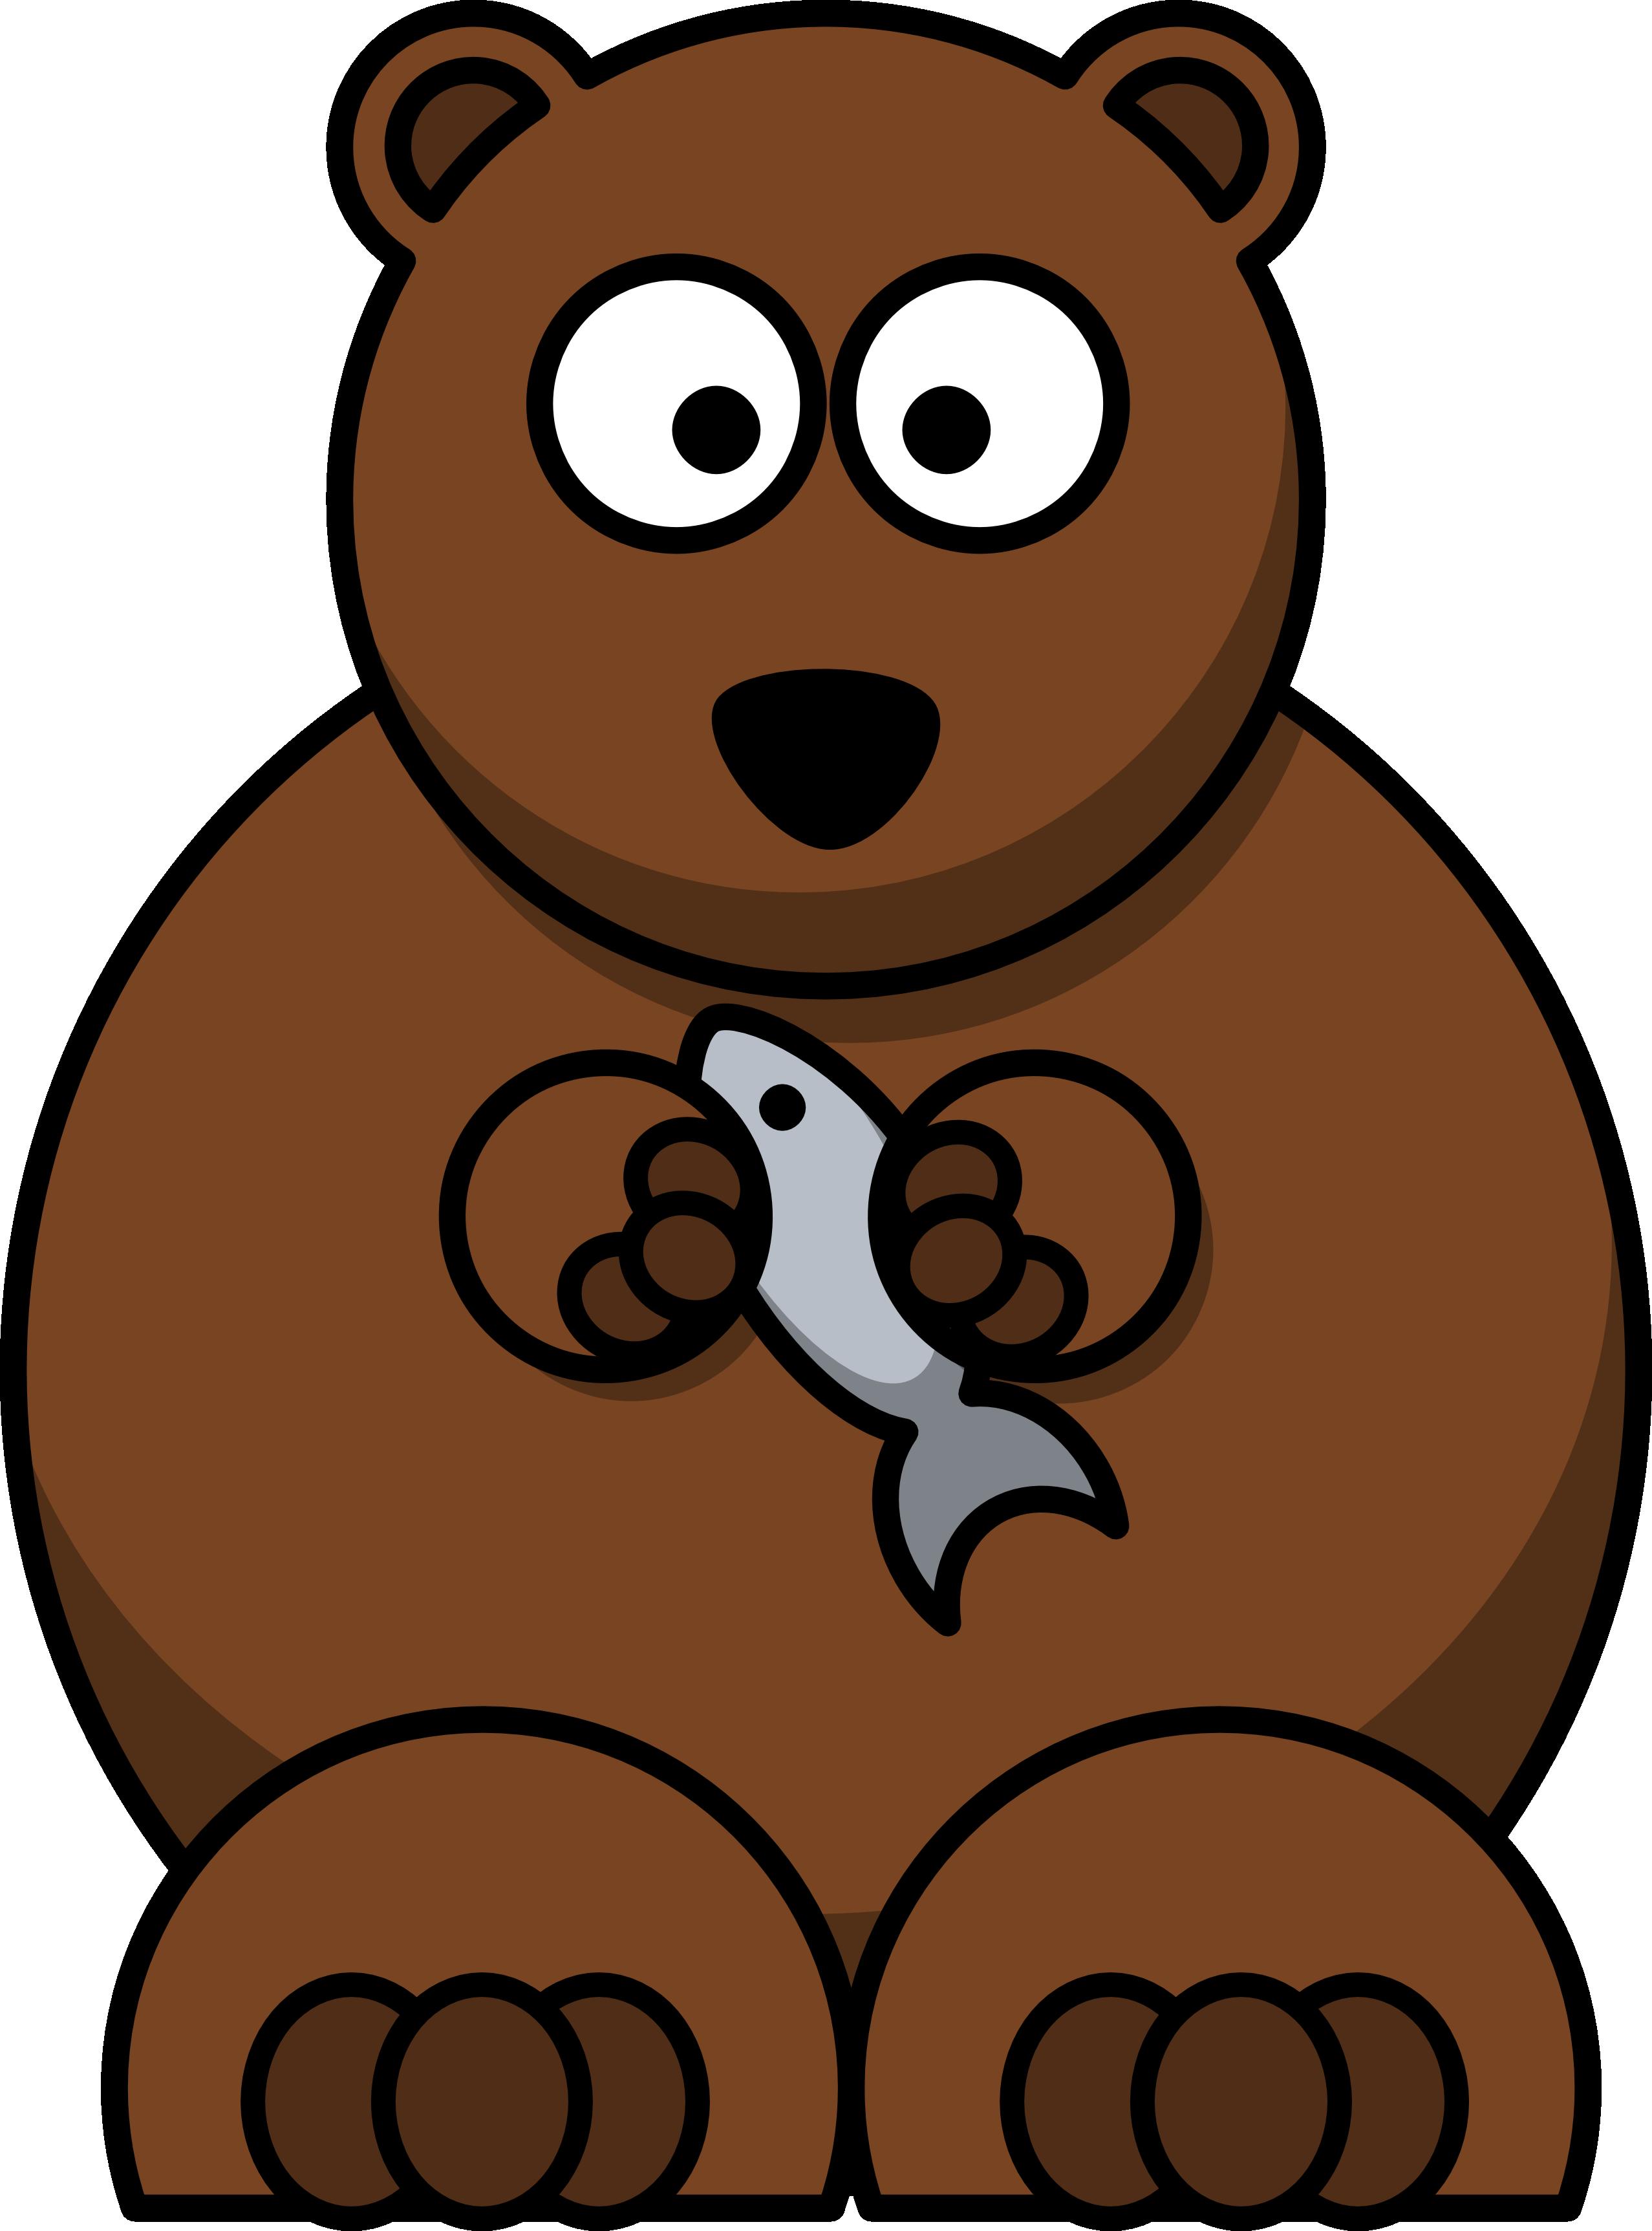 Baseball bears clipart png free stock bear png free stock